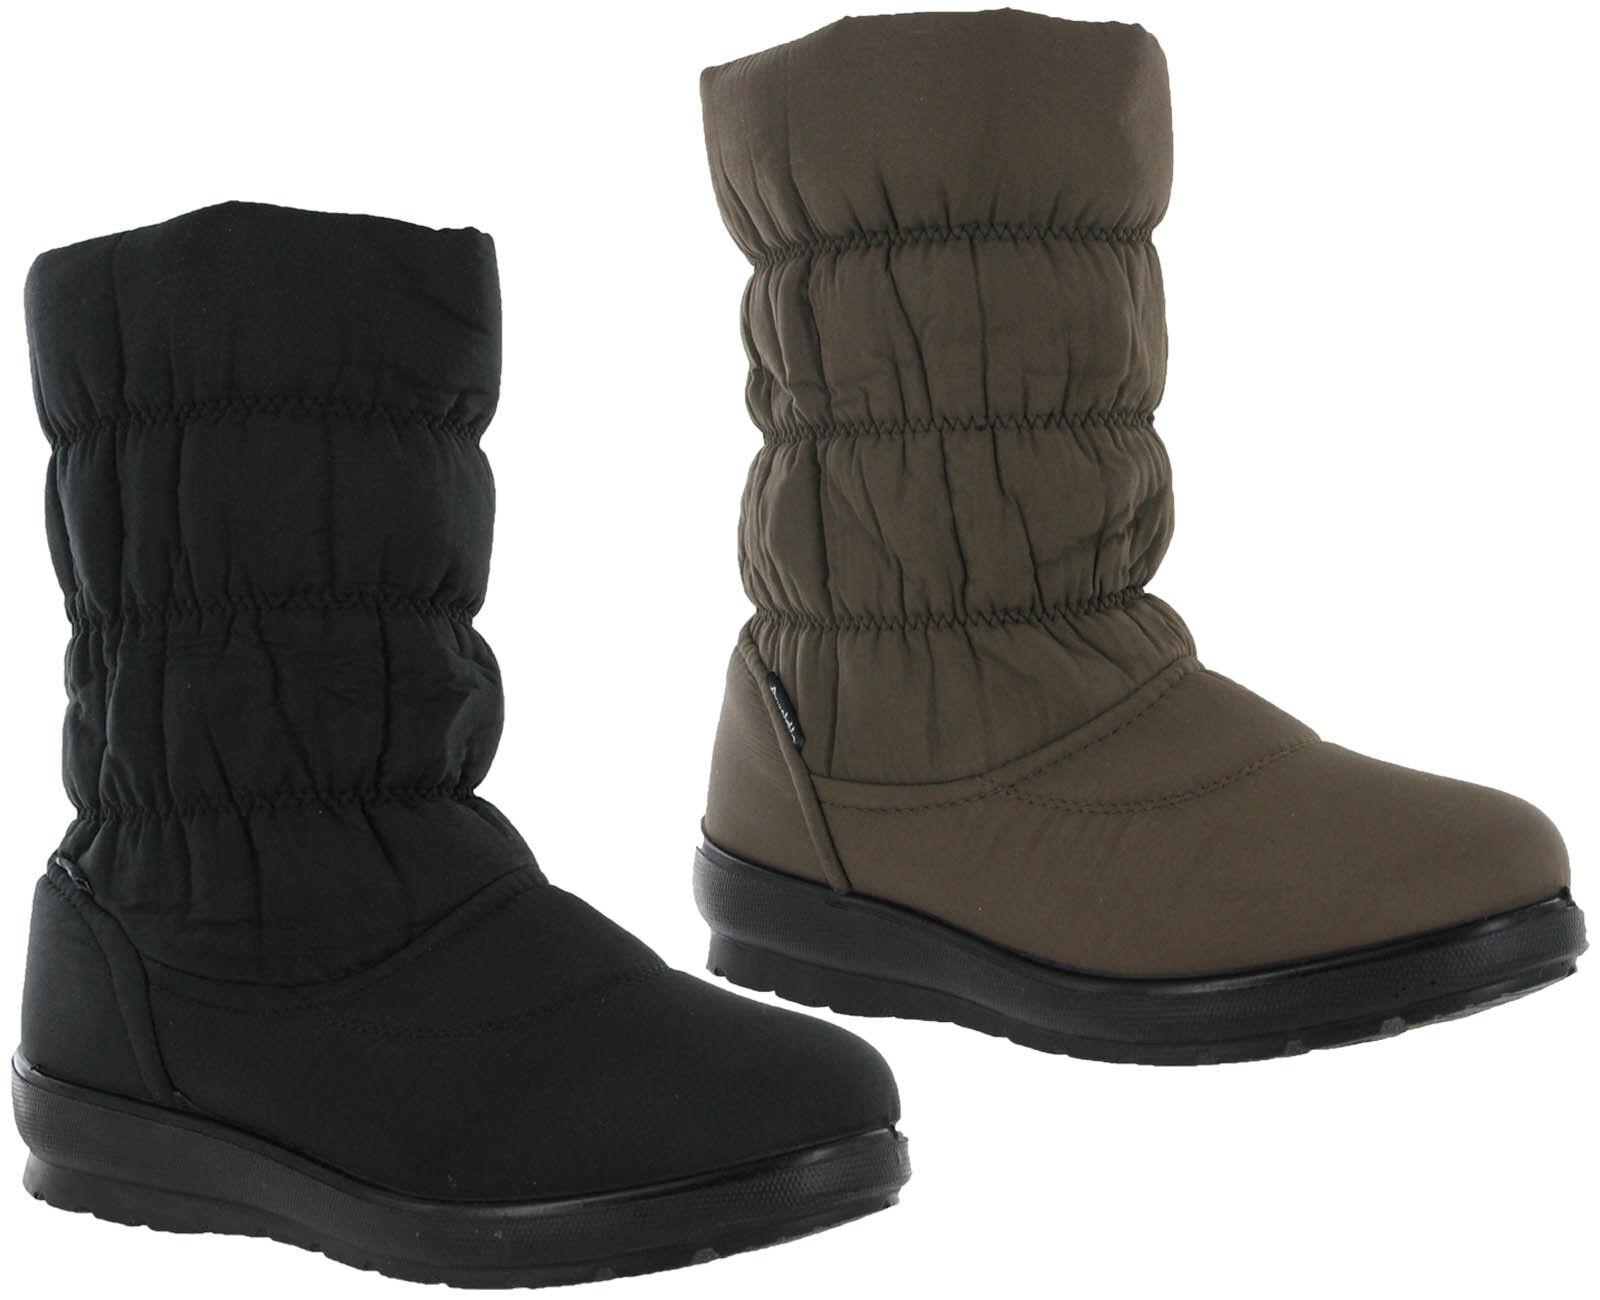 Annabelle Winter Fur Lined Janelle Side Zip Lighweight Grip Womens Boots UK4-8